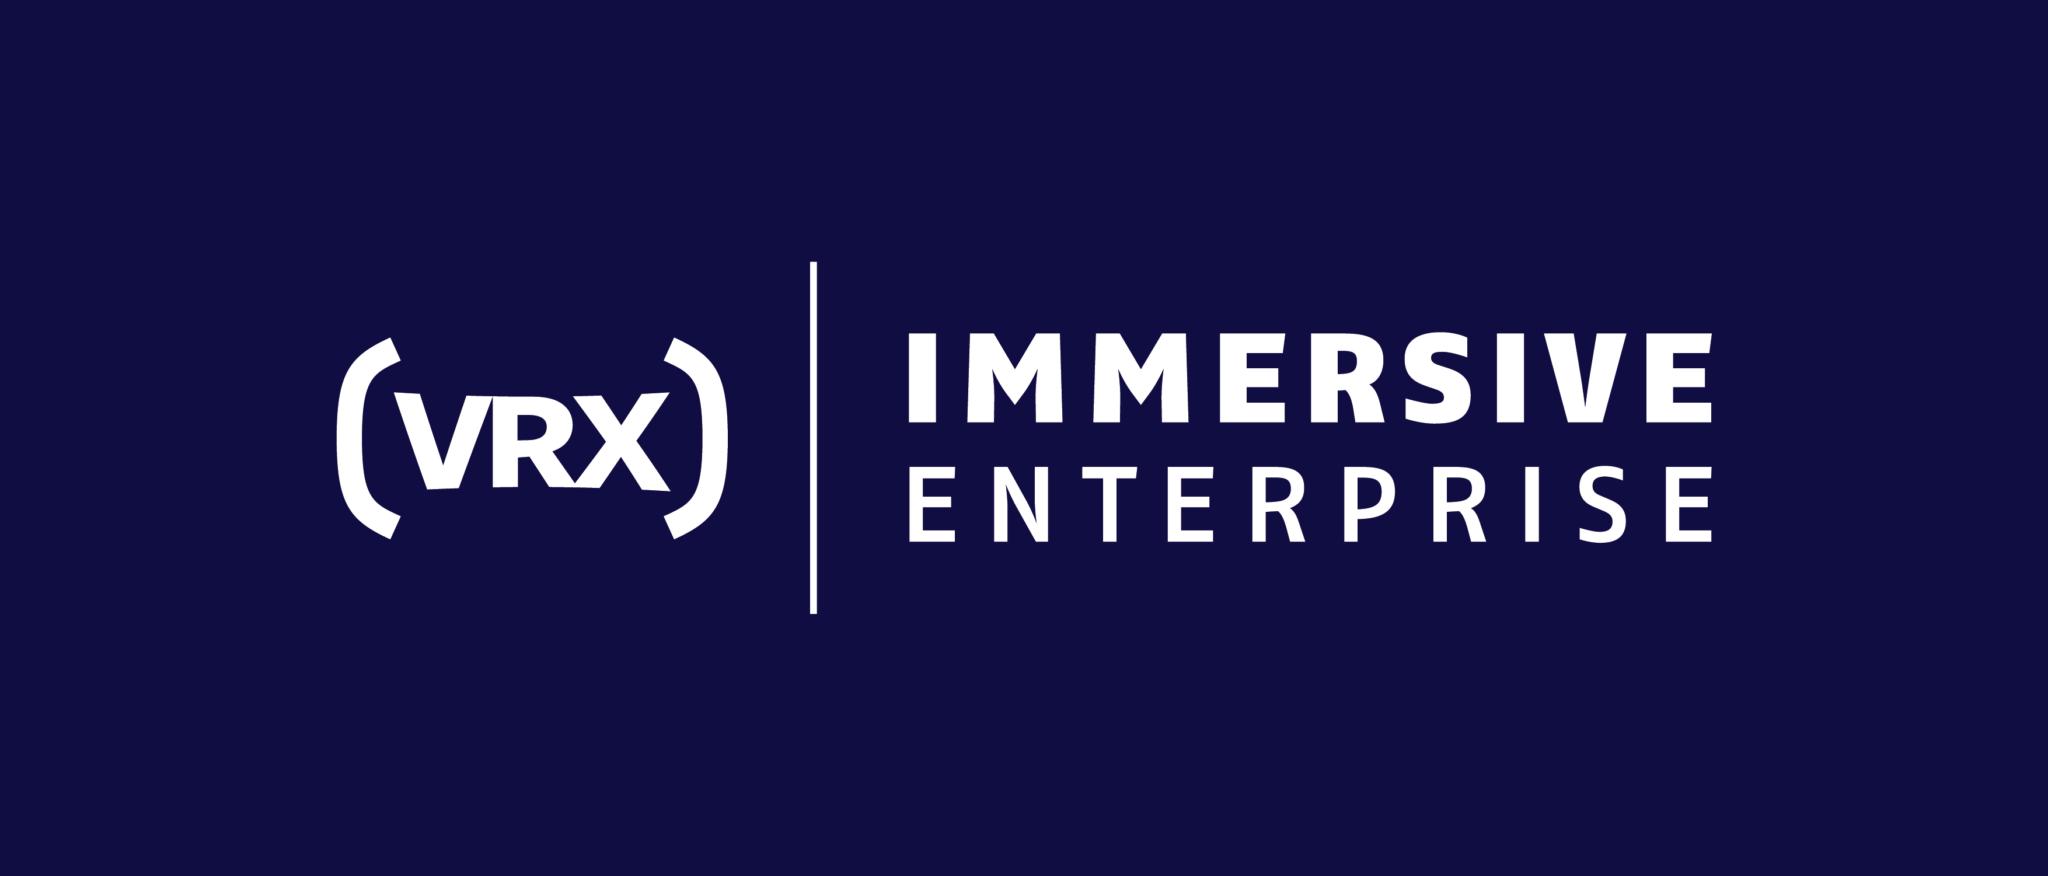 VRX_immersive_enterprise